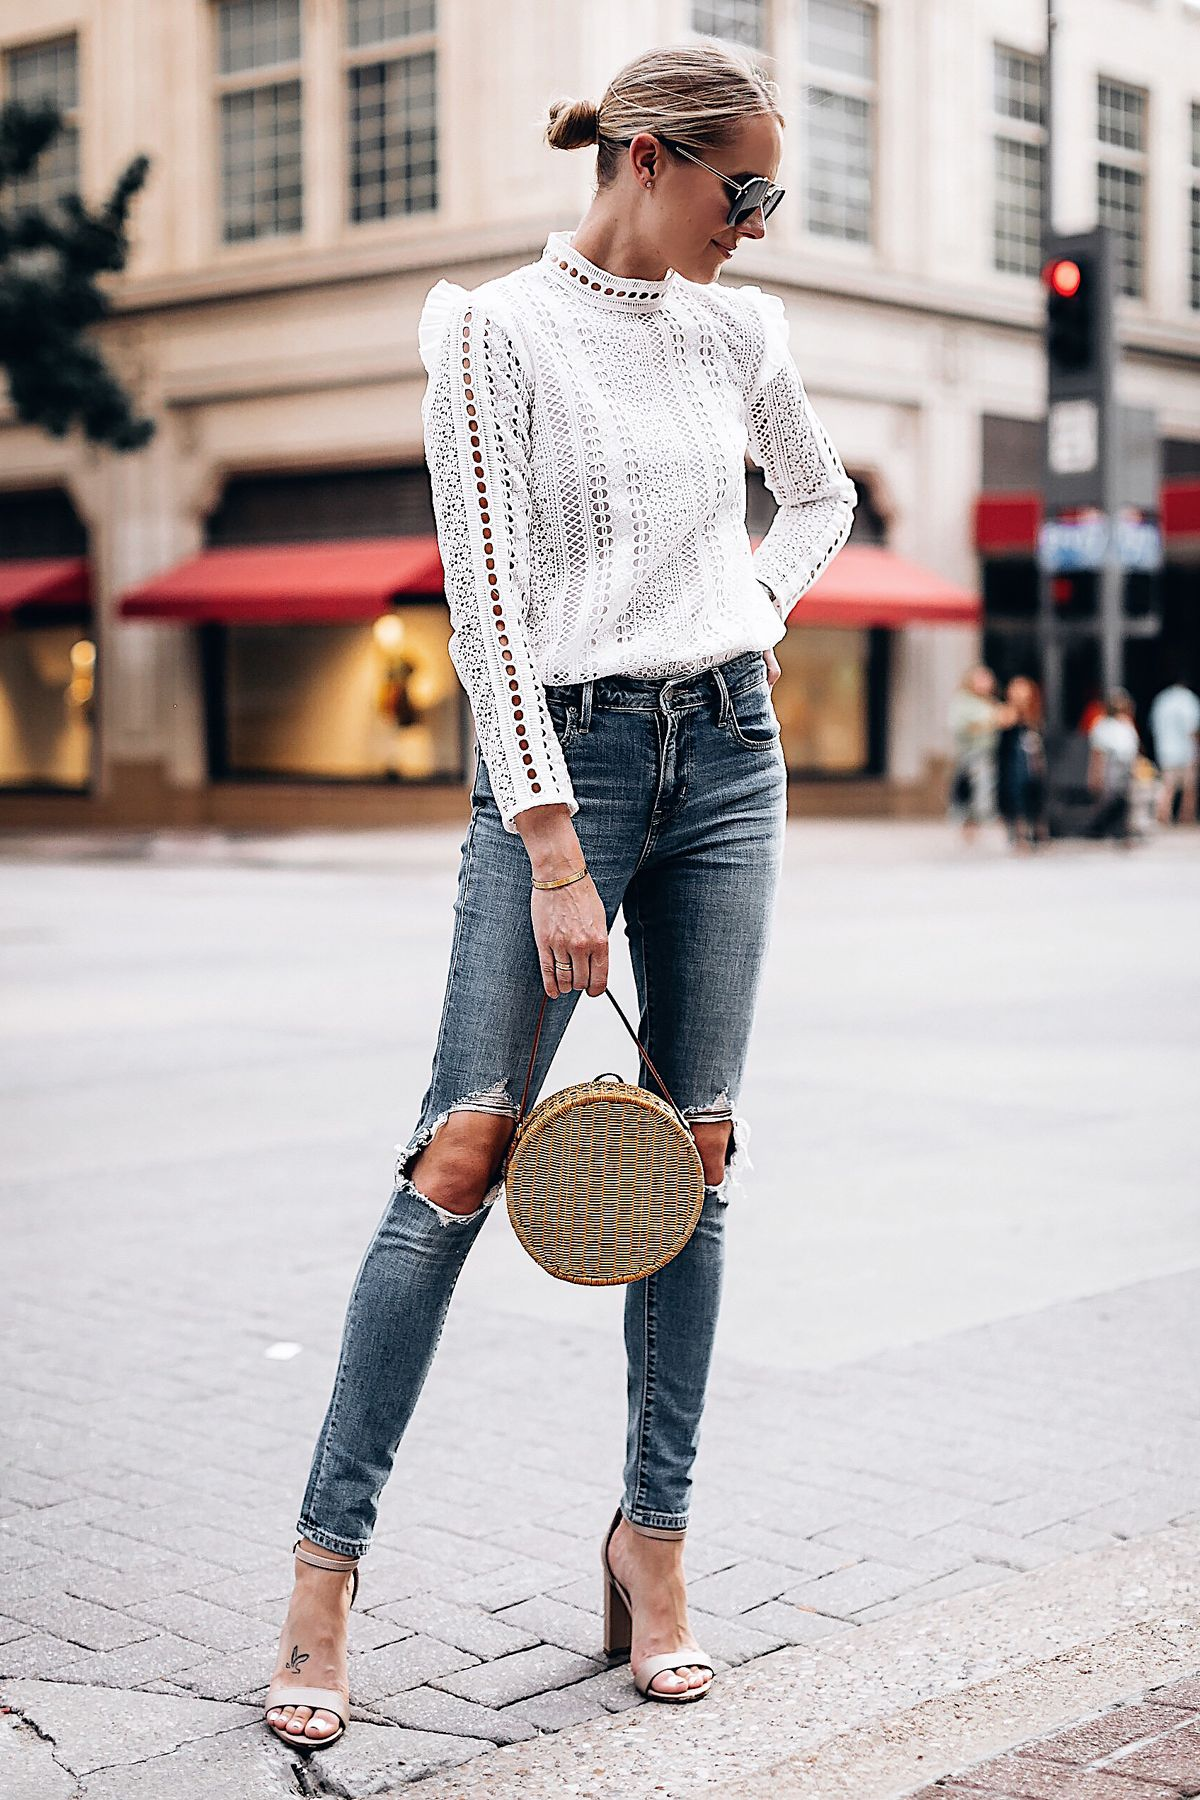 126b93be87e Blonde Woman Wearing Fashion Jackson Bloomingdales AQUA White Lace Ruffle  Top Levis 721 Skinny Jeans Tan Ankle Strap Heeled Sandals Serpui Straw  Circle ...